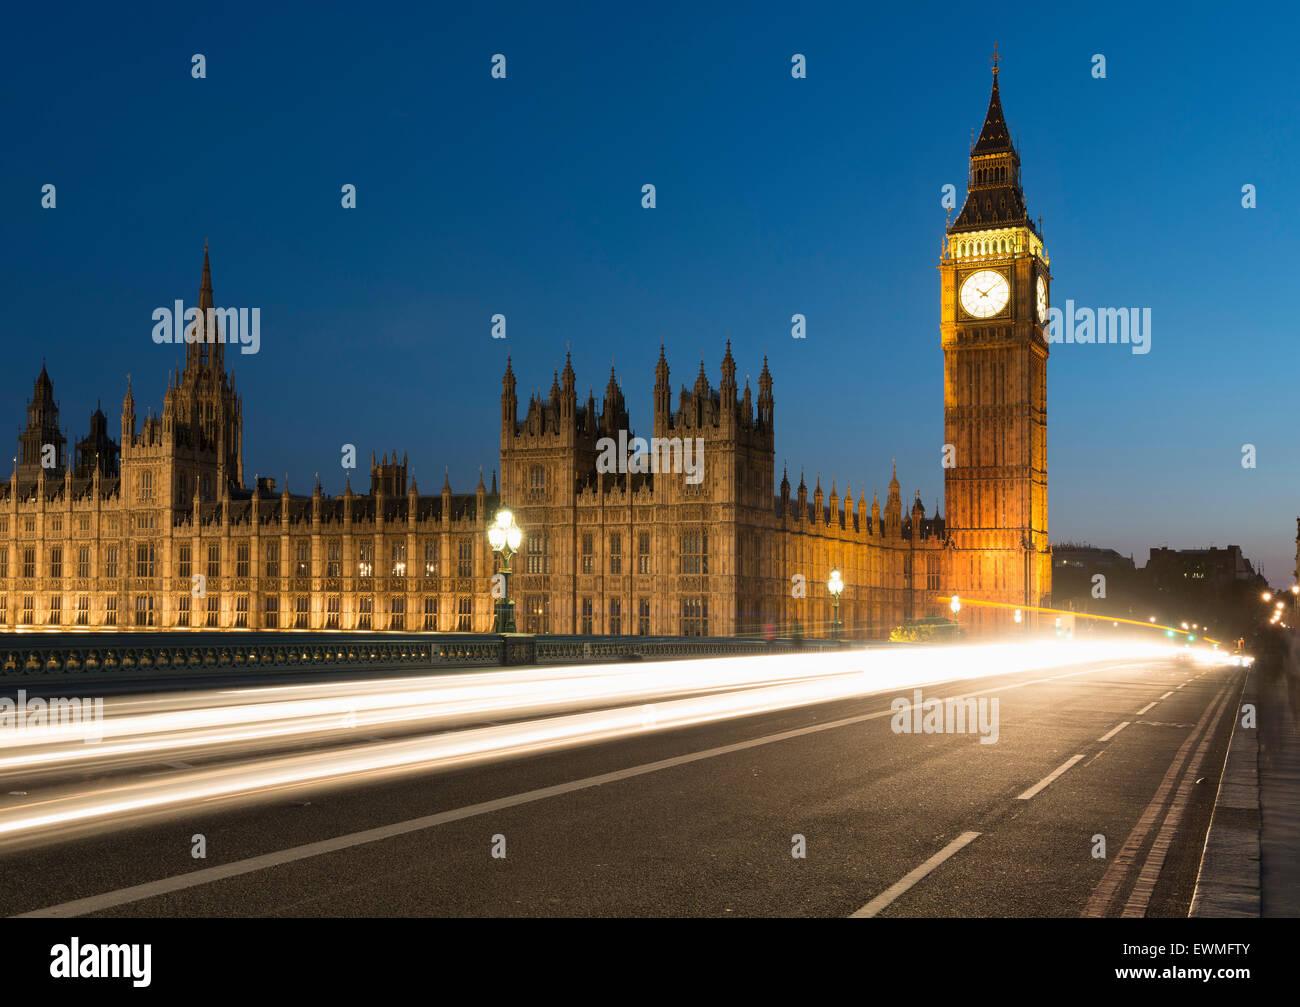 Big Ben and Houses of Parliament, Westminster Bridge, London, England, United Kingdom - Stock Image